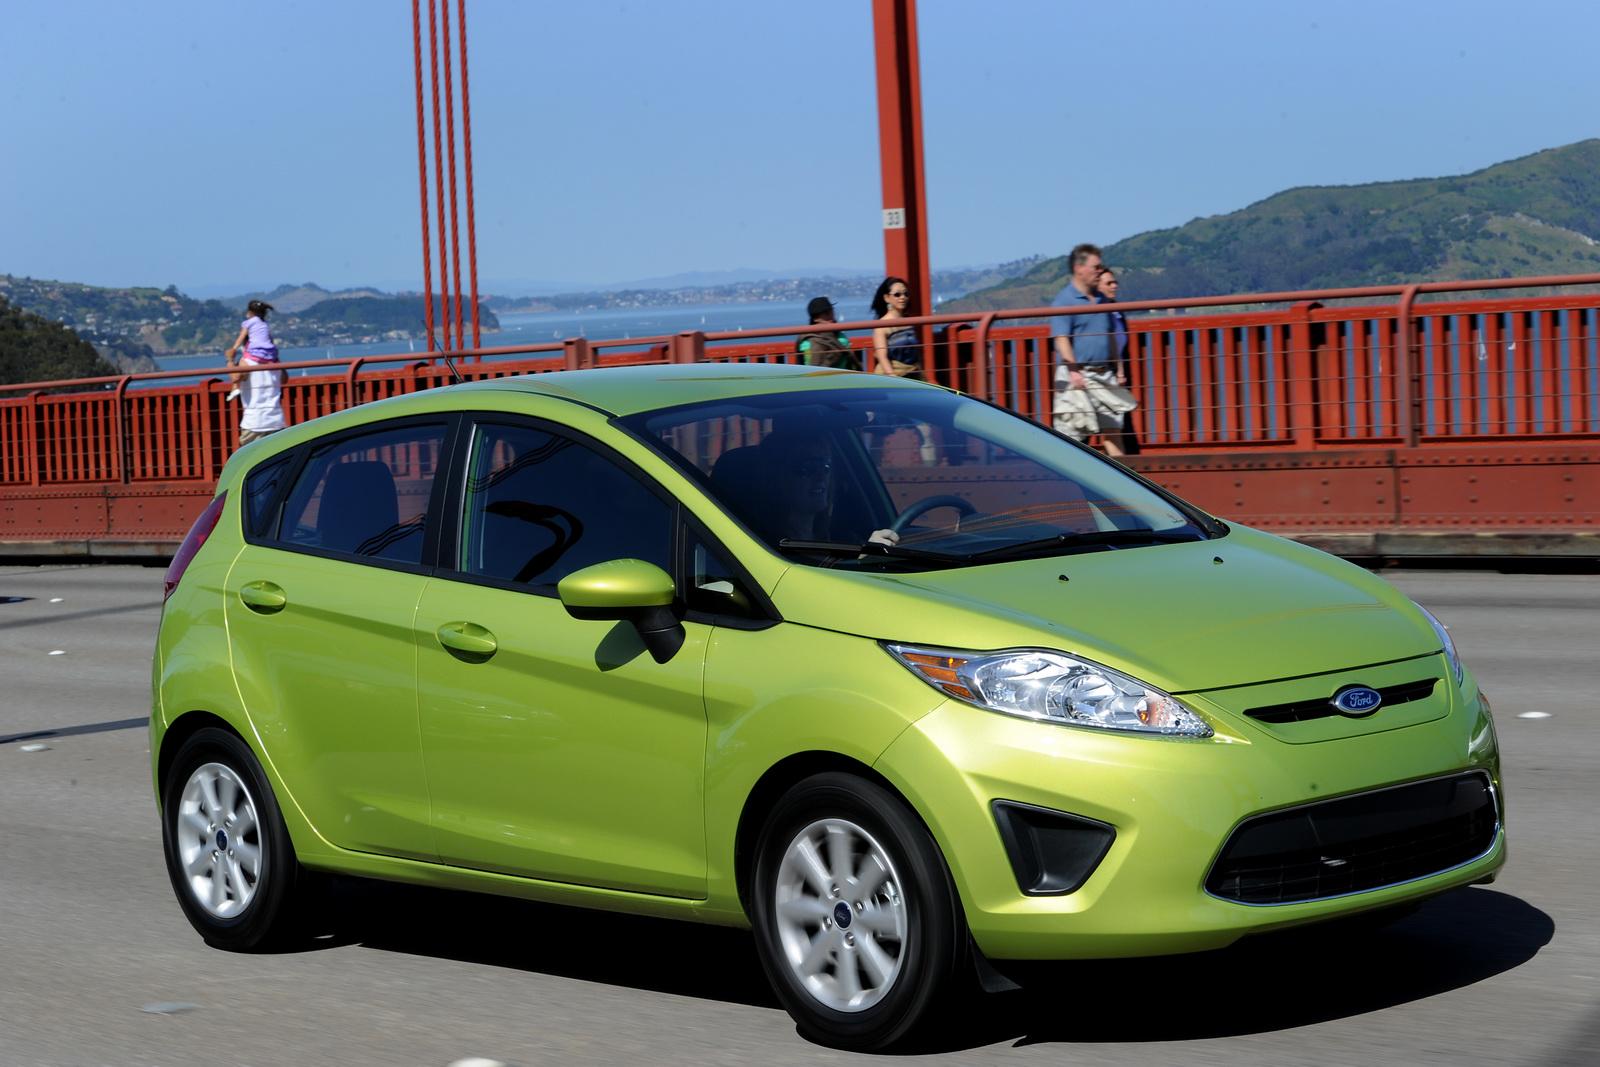 http://1.bp.blogspot.com/_FoXyvaPSnVk/S_H0M47-lTI/AAAAAAAC3AQ/EXVCGYbBqRI/s1600/2011-Ford-Fiesta-10.jpg